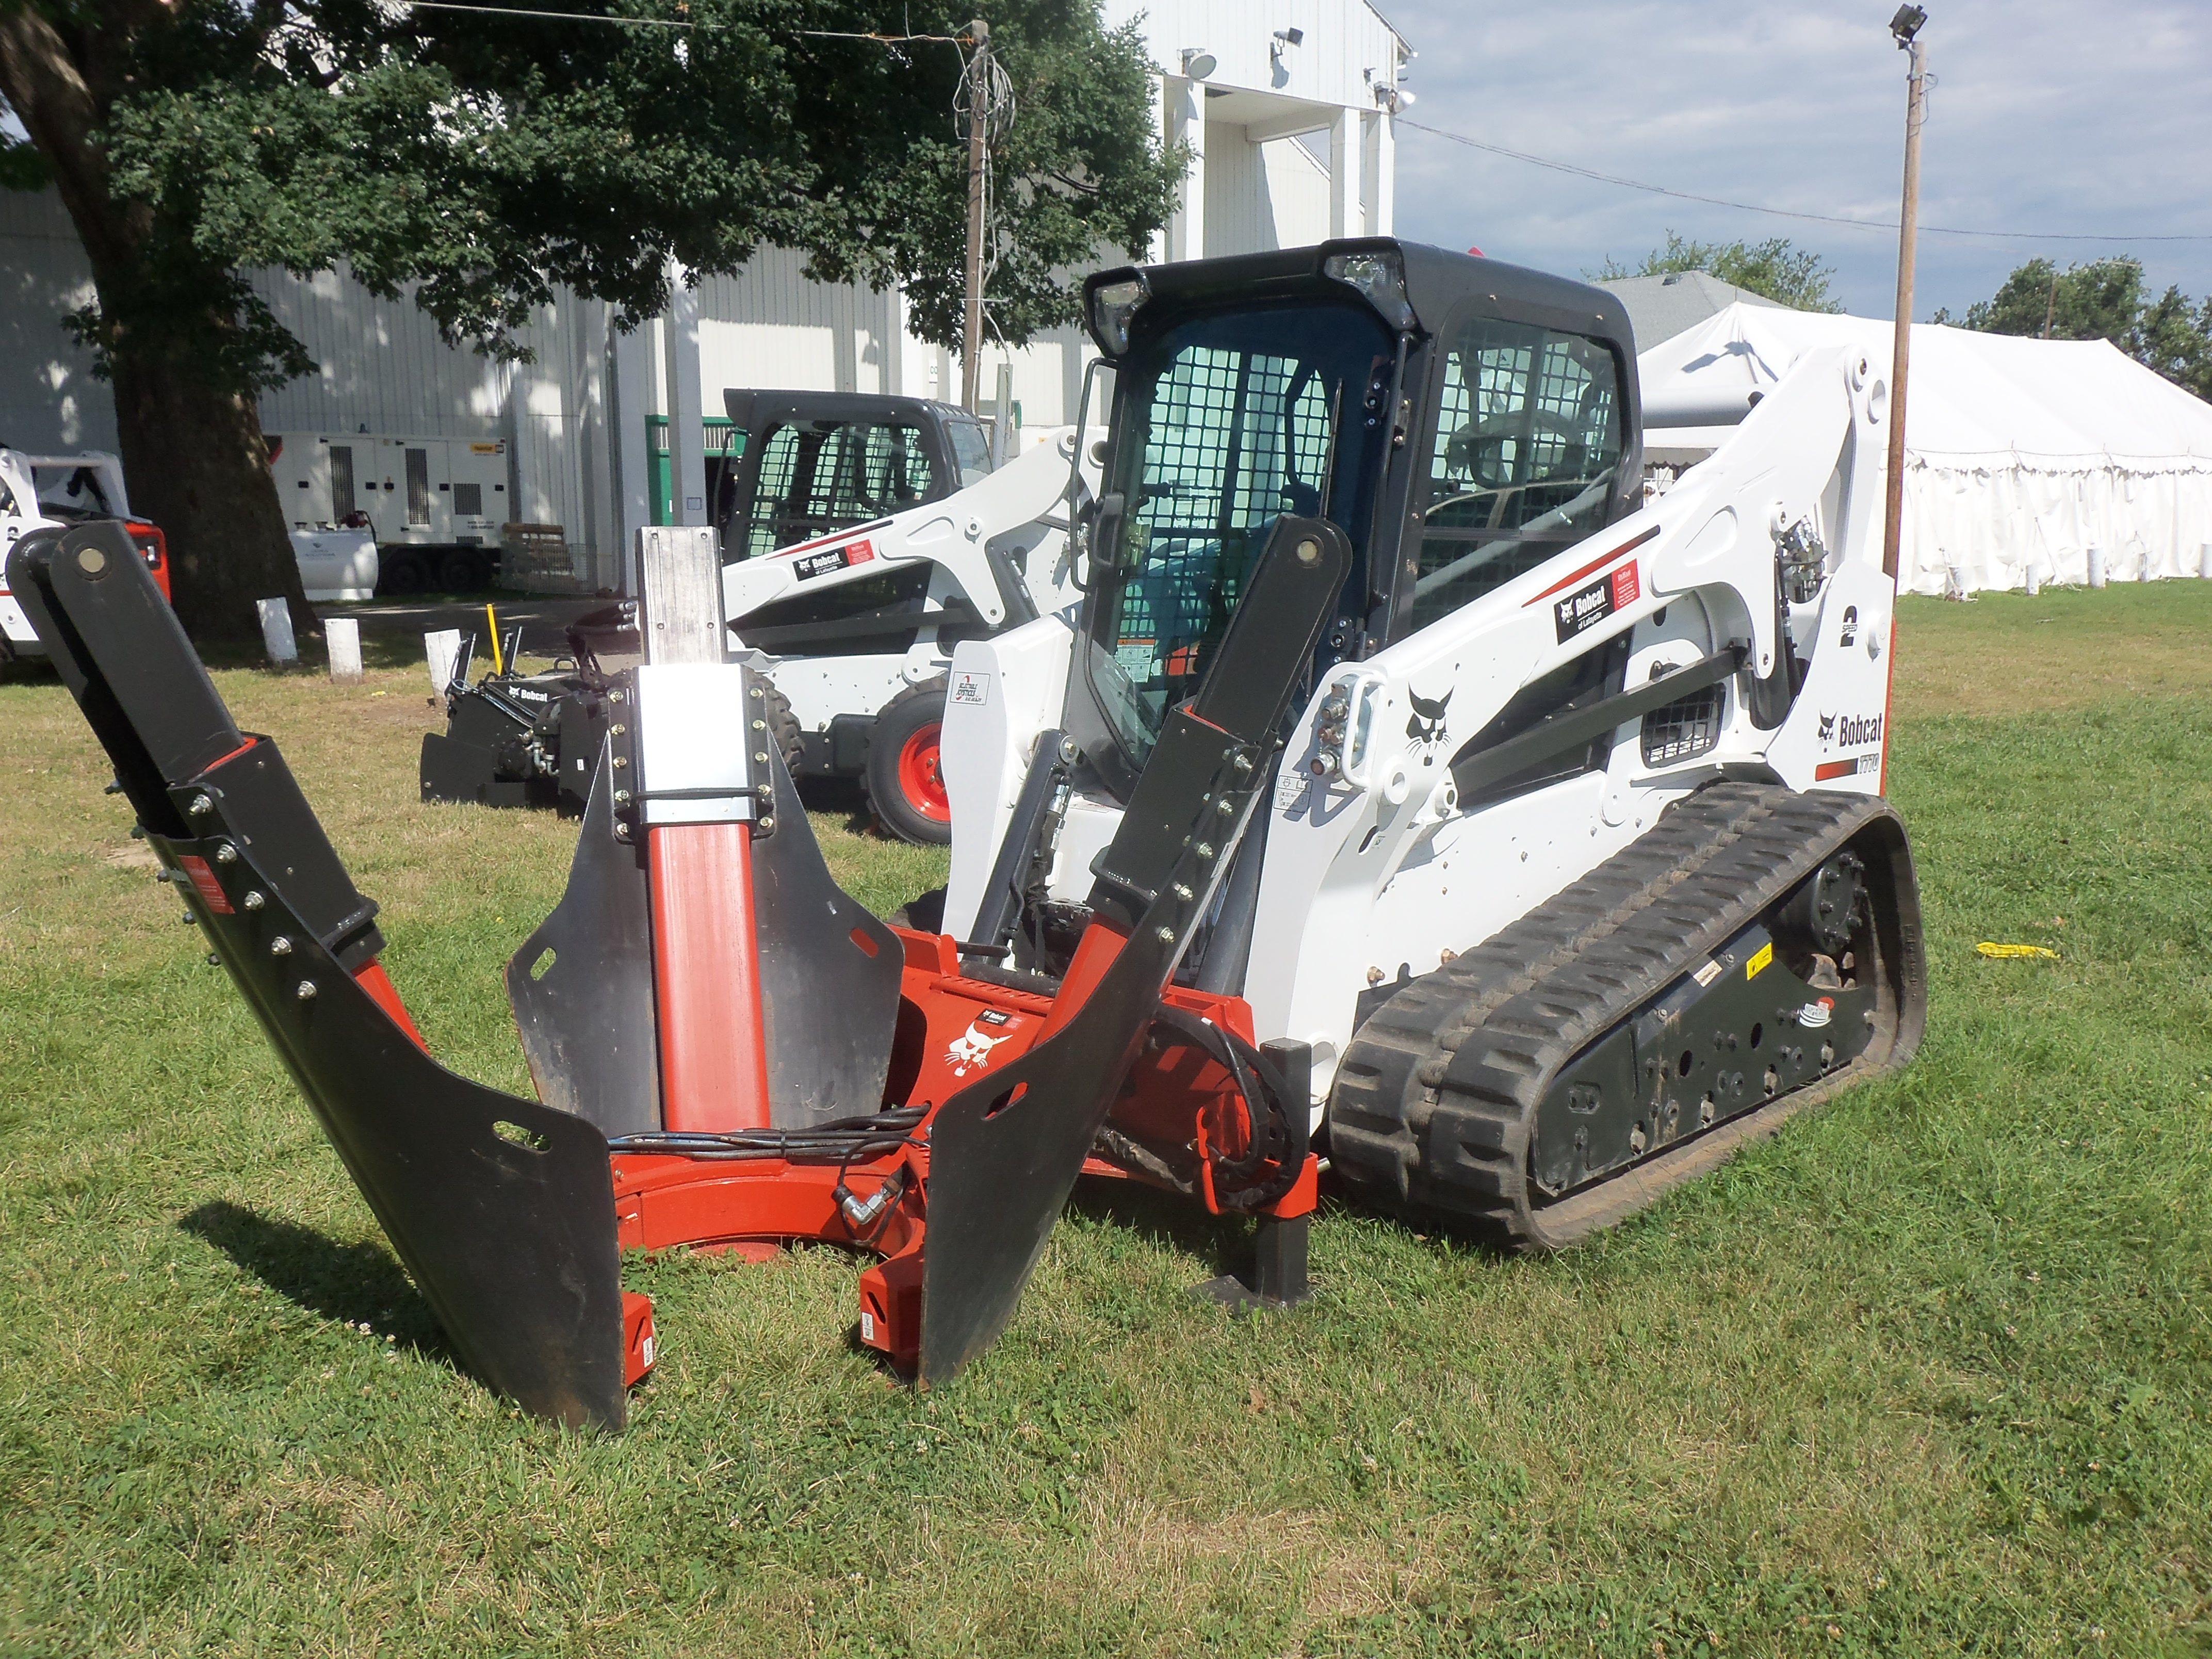 Bobcat T770 Compact Track Loader Construction Equipment